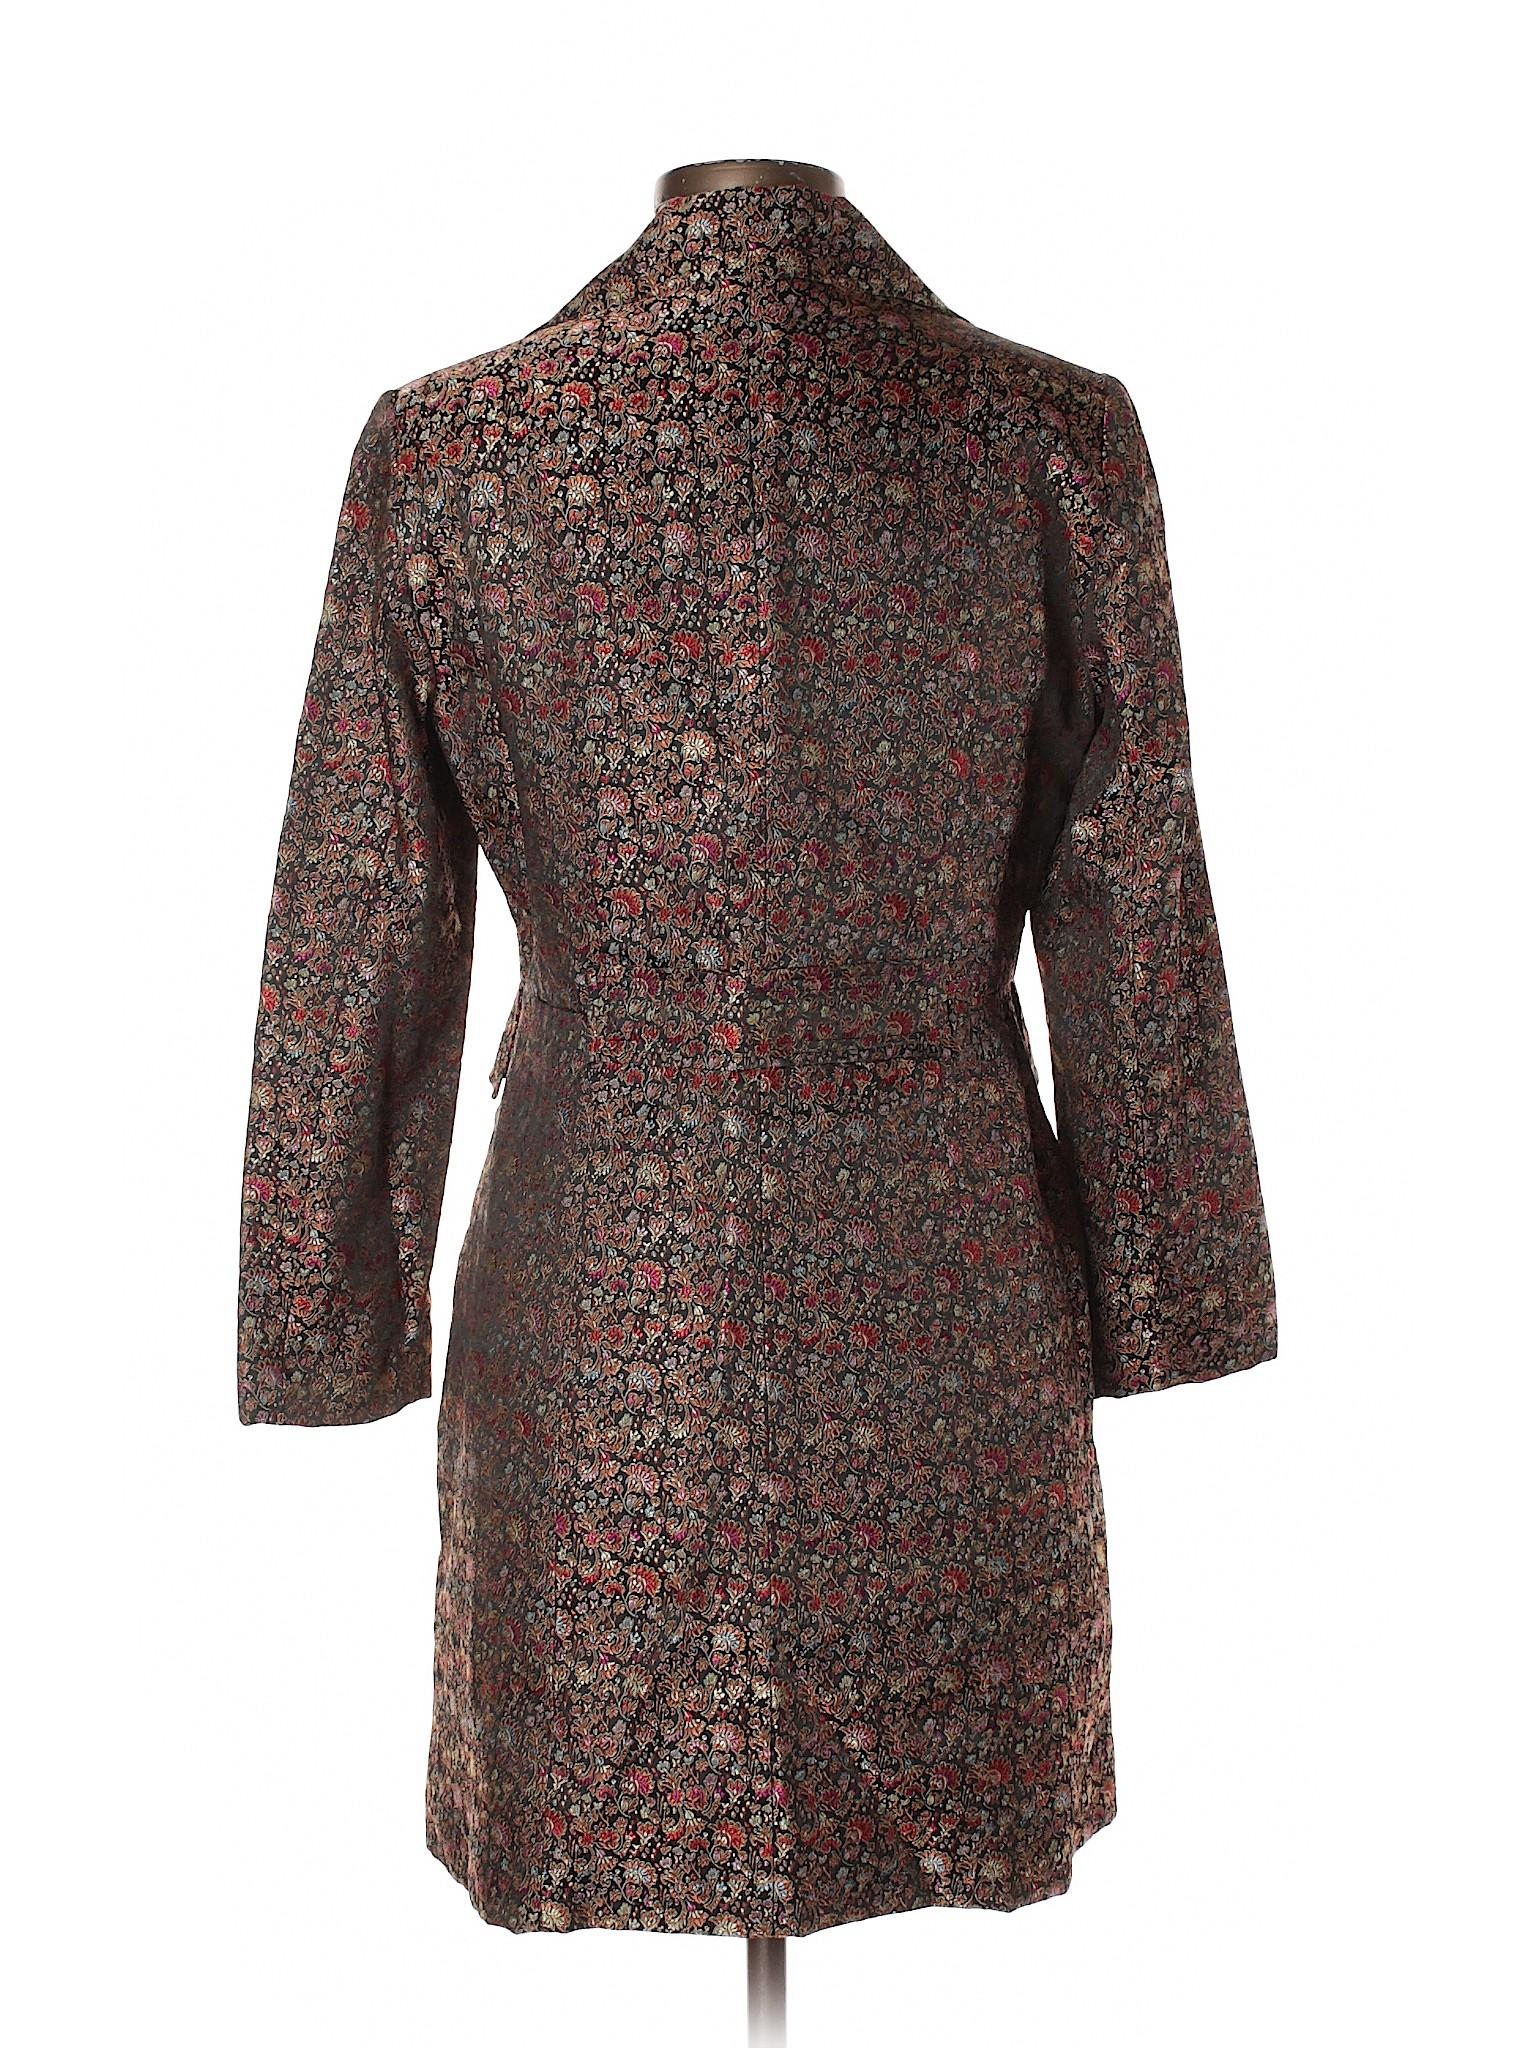 Y Boutique D W Coat N winter 8rzP8